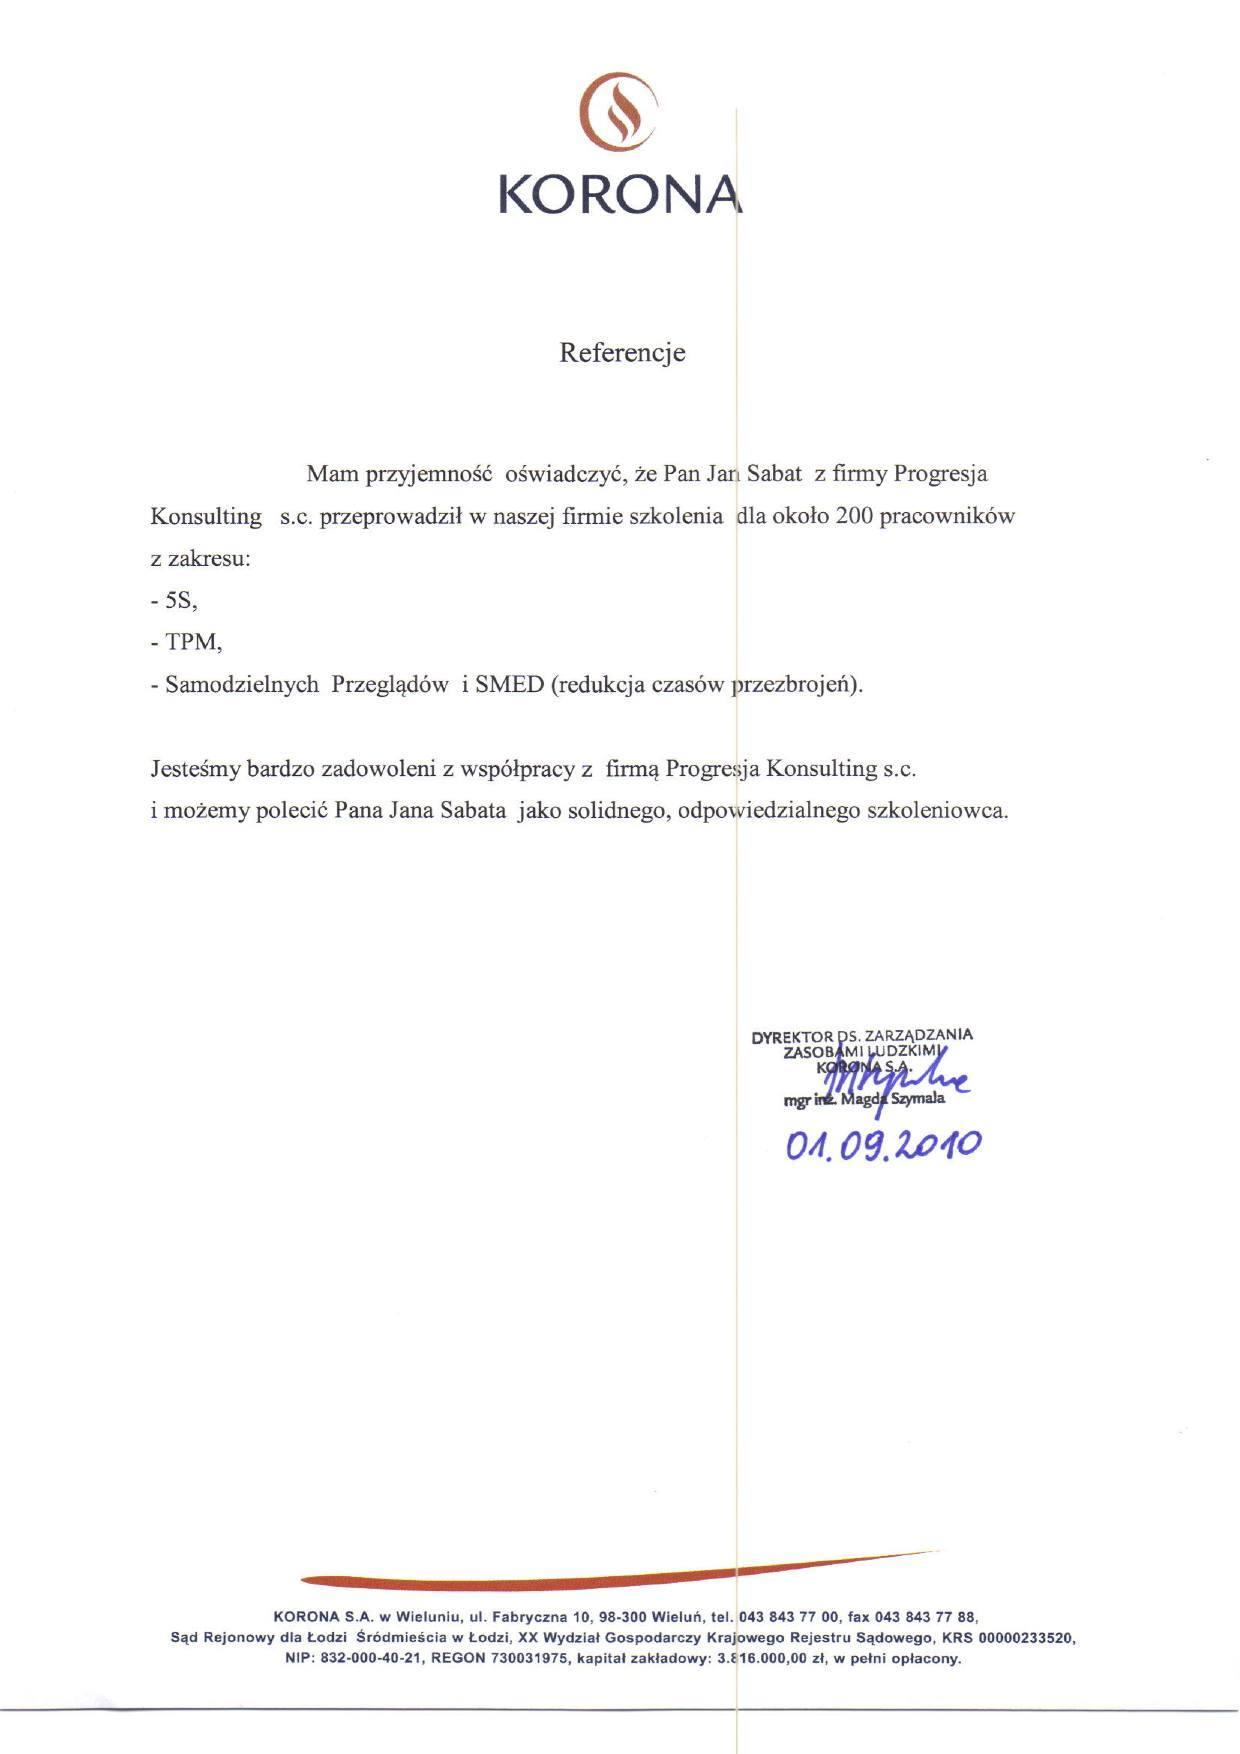 Sabat Consulting - Korona - referencje